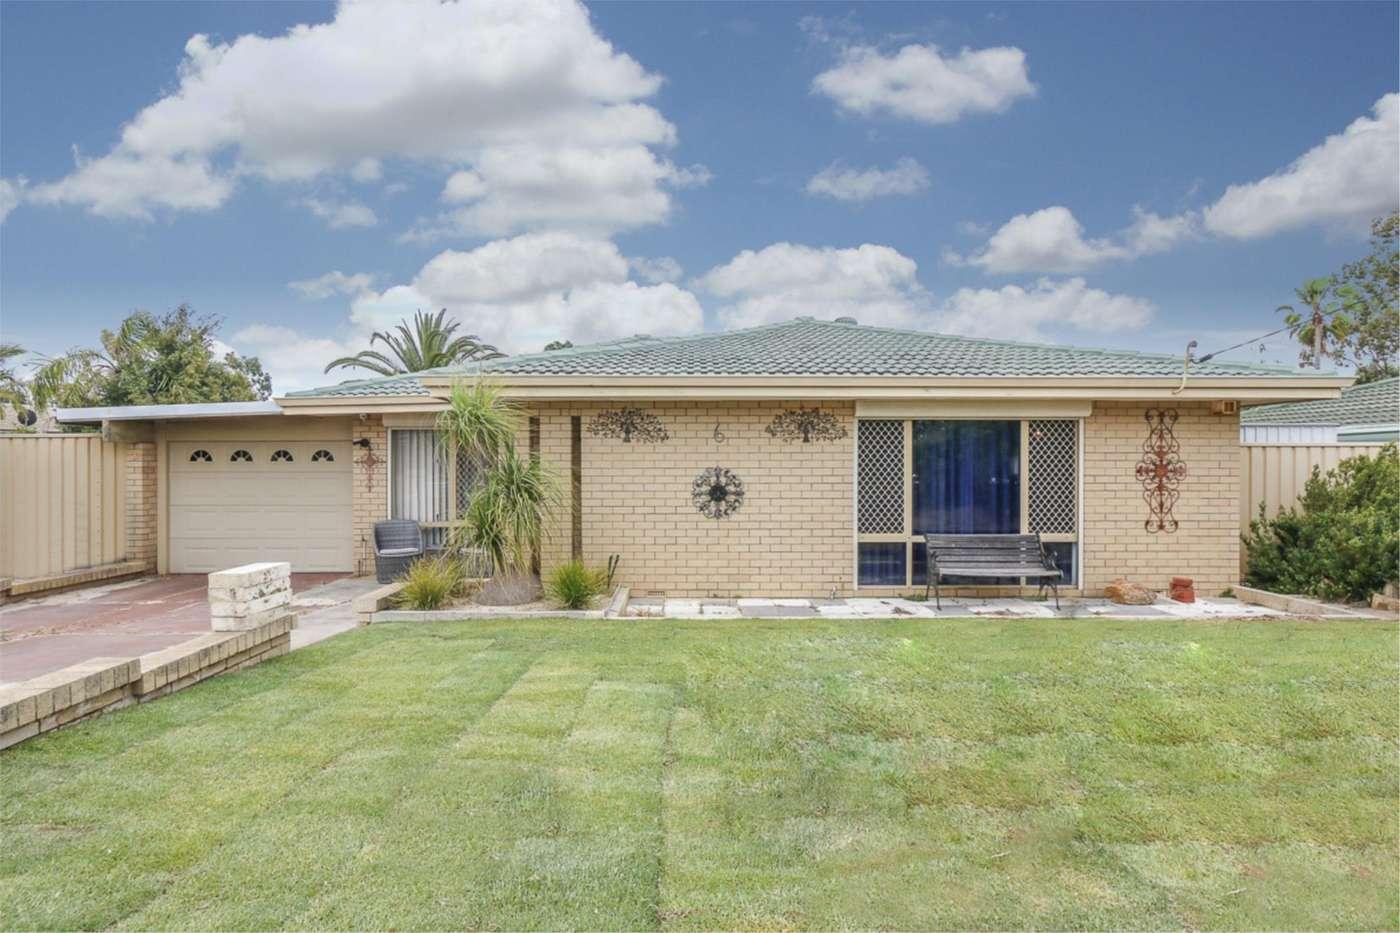 Main view of Homely house listing, 6 Hollingsworth Avenue, Koondoola, WA 6064